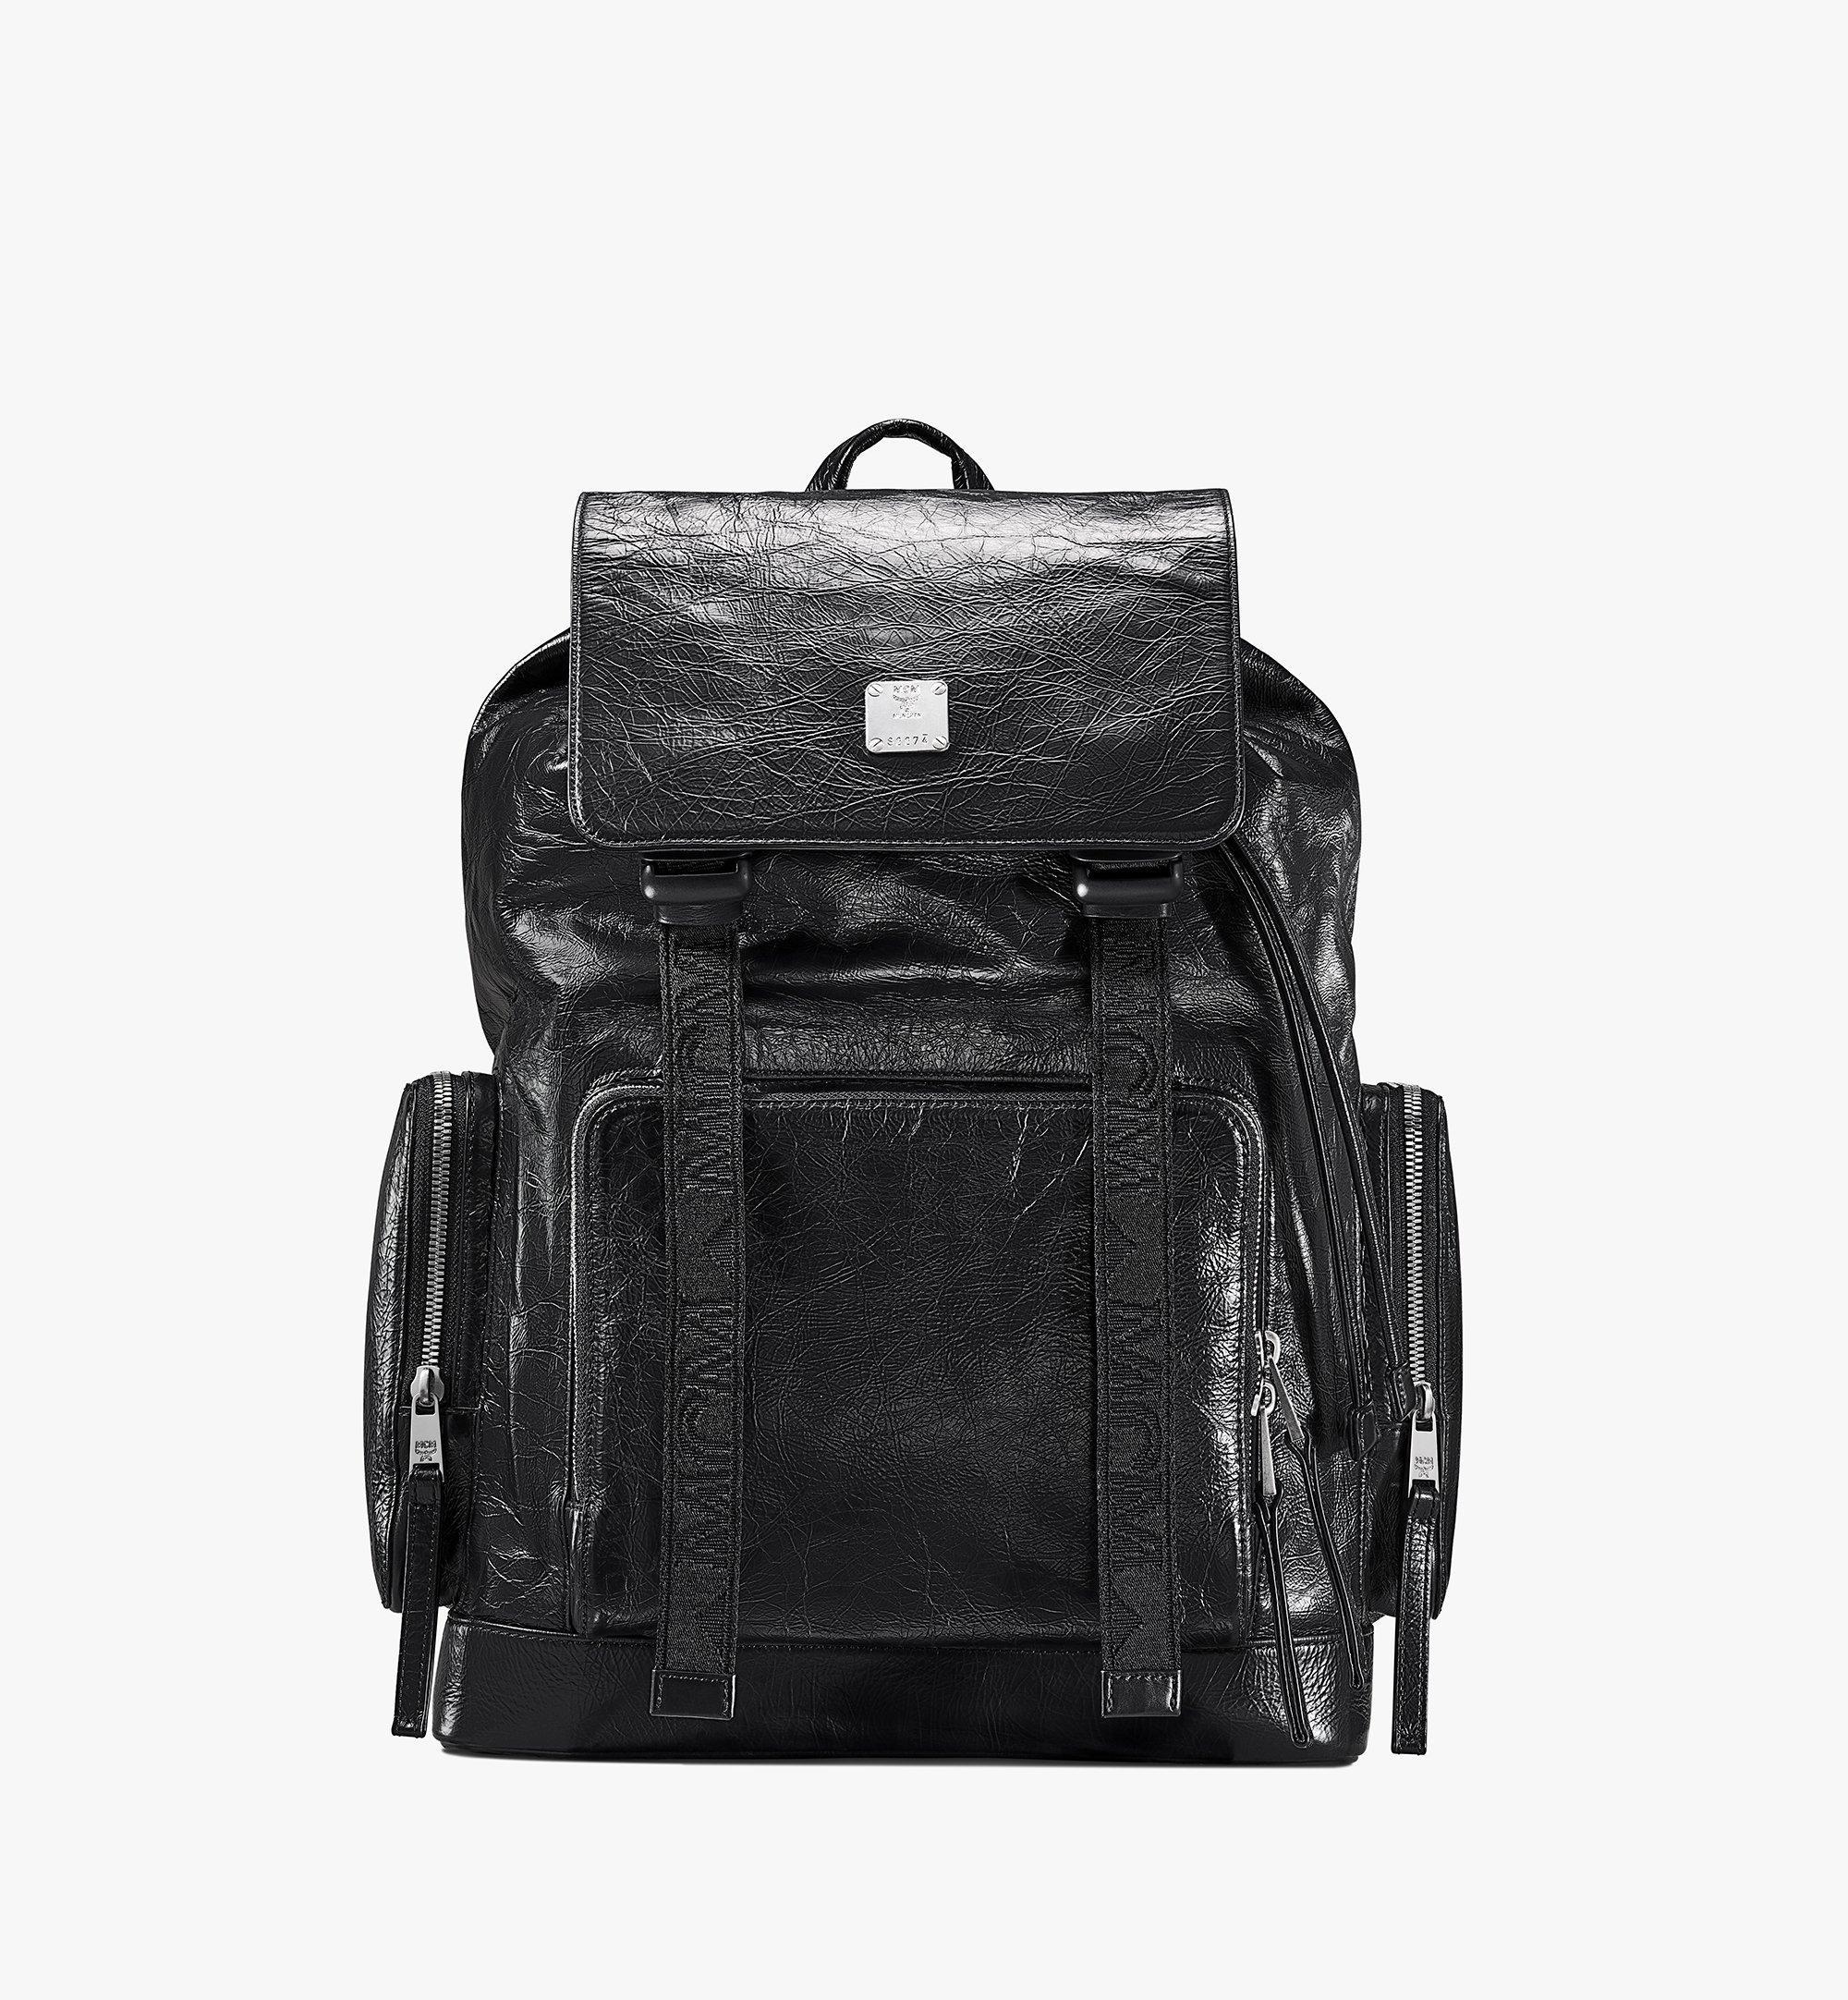 MCM Brandenburg Backpack in Crushed Leather Black MMKASBG02BK001 Alternate View 1